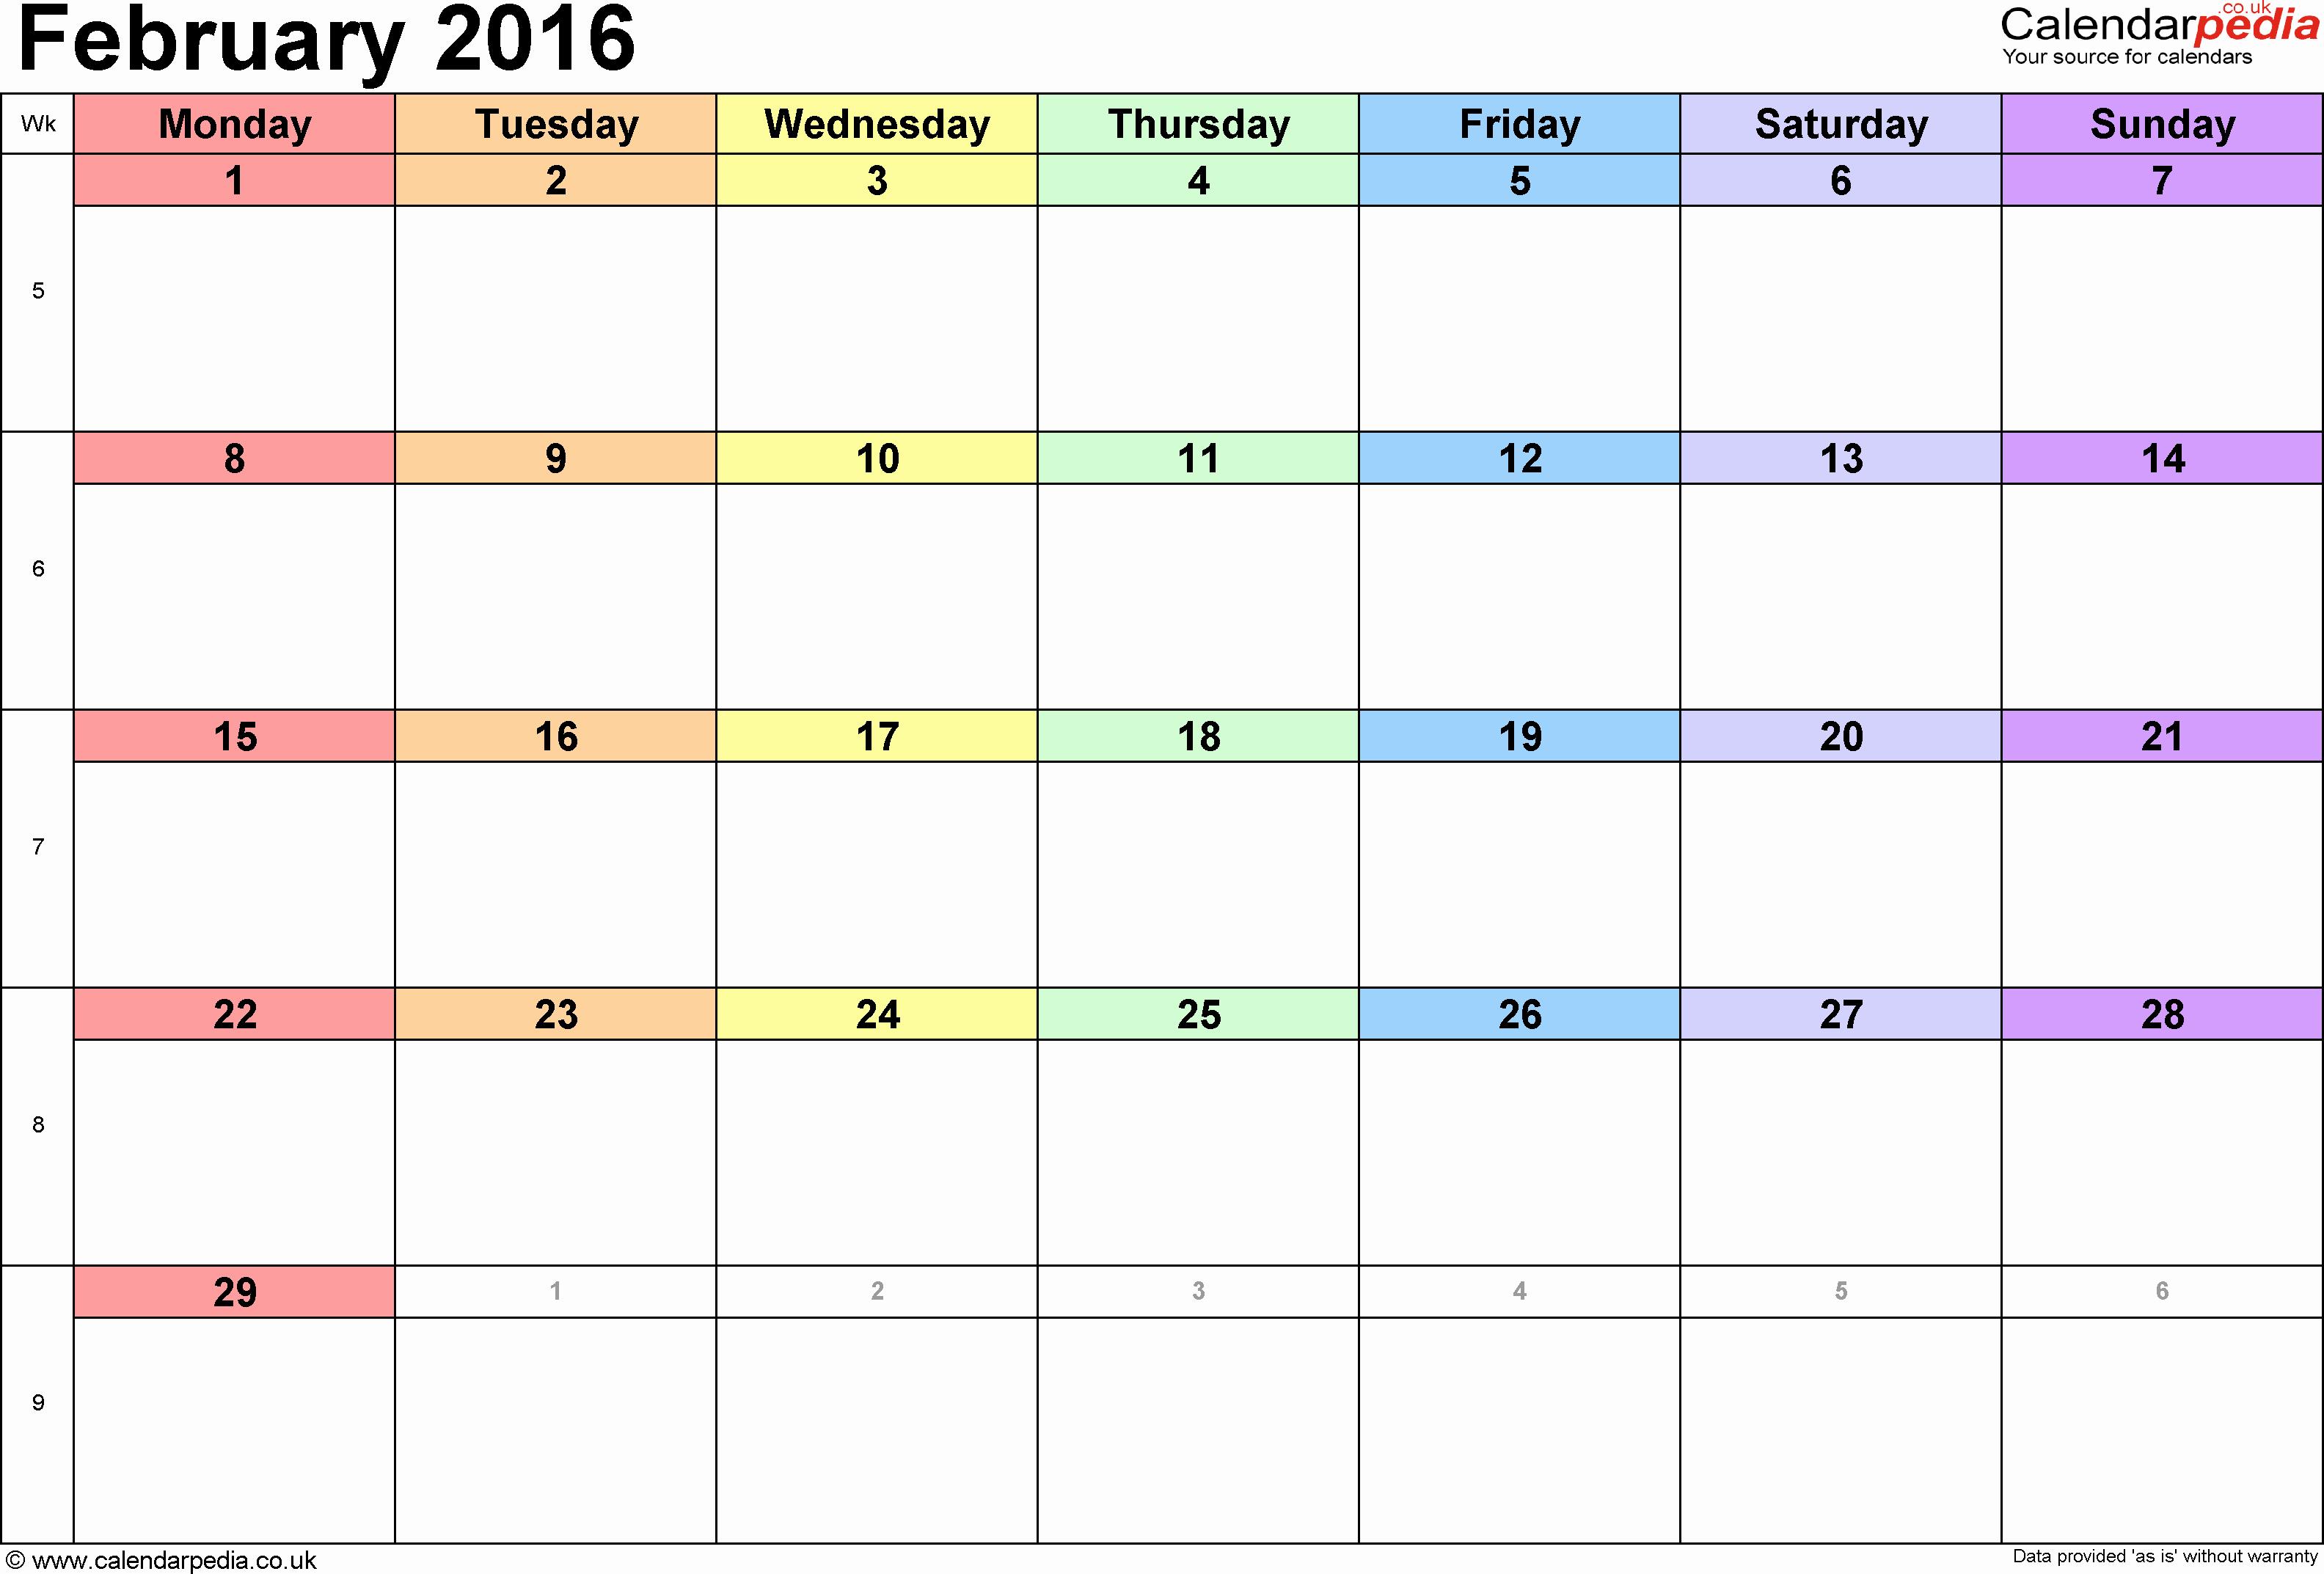 2016 Calendar Excel with Holidays Lovely Calendar February 2016 Uk Bank Holidays Excel Pdf Word